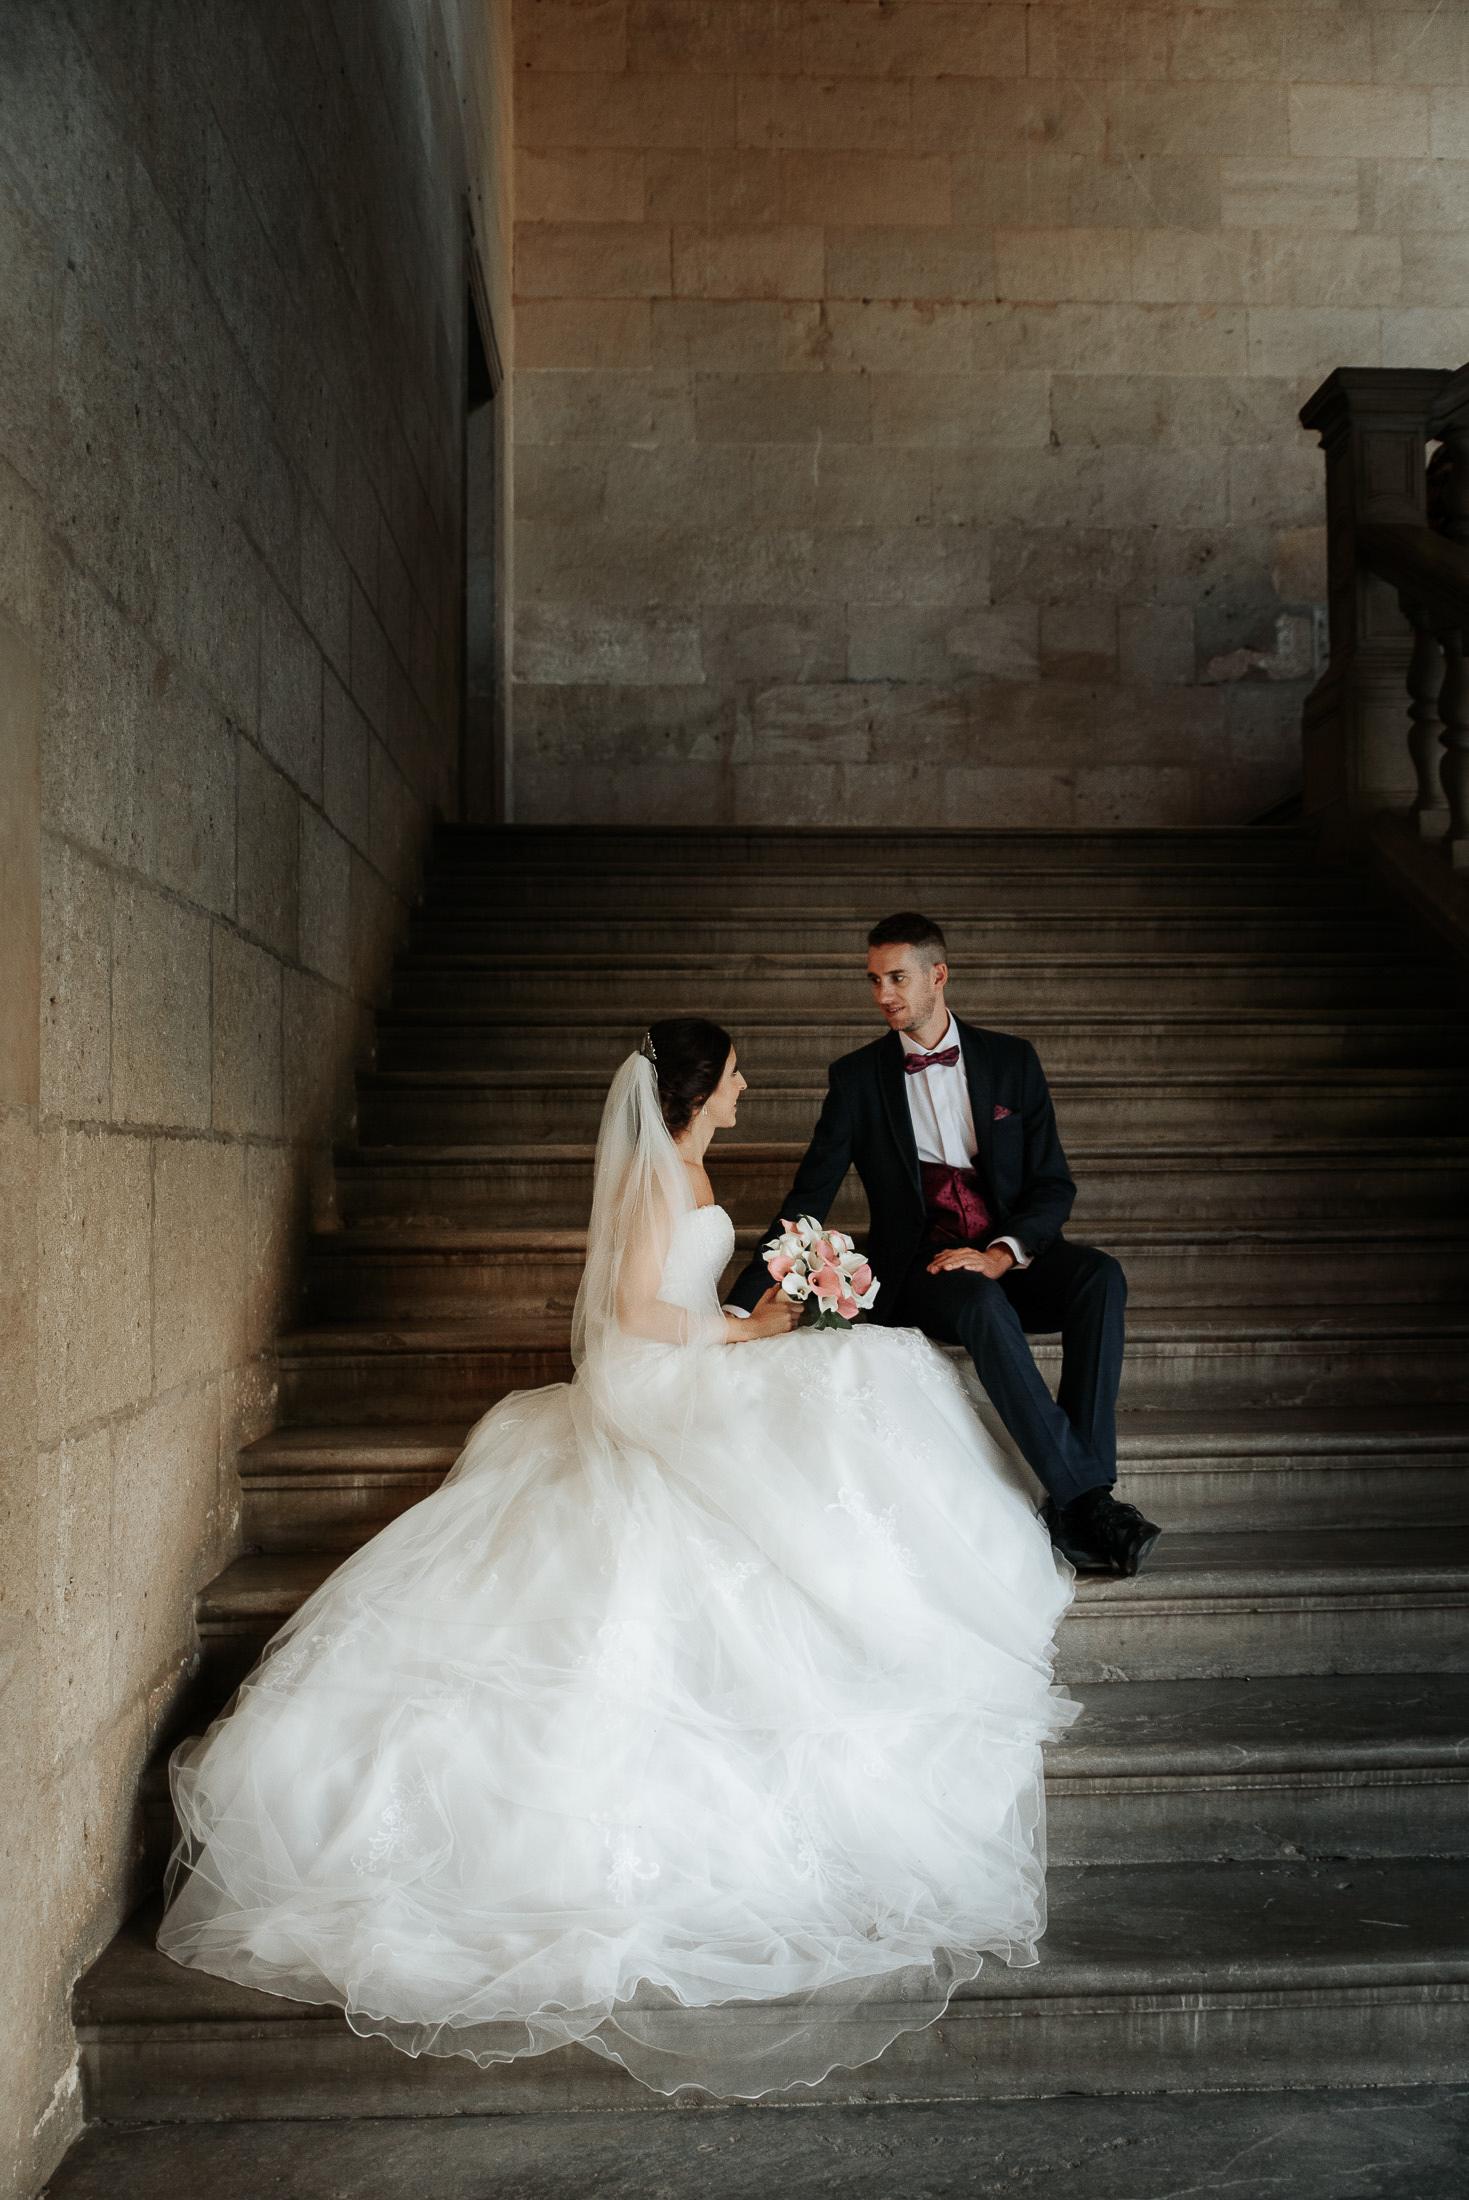 Alhambra Wedding - Nice couple at the photo shooting